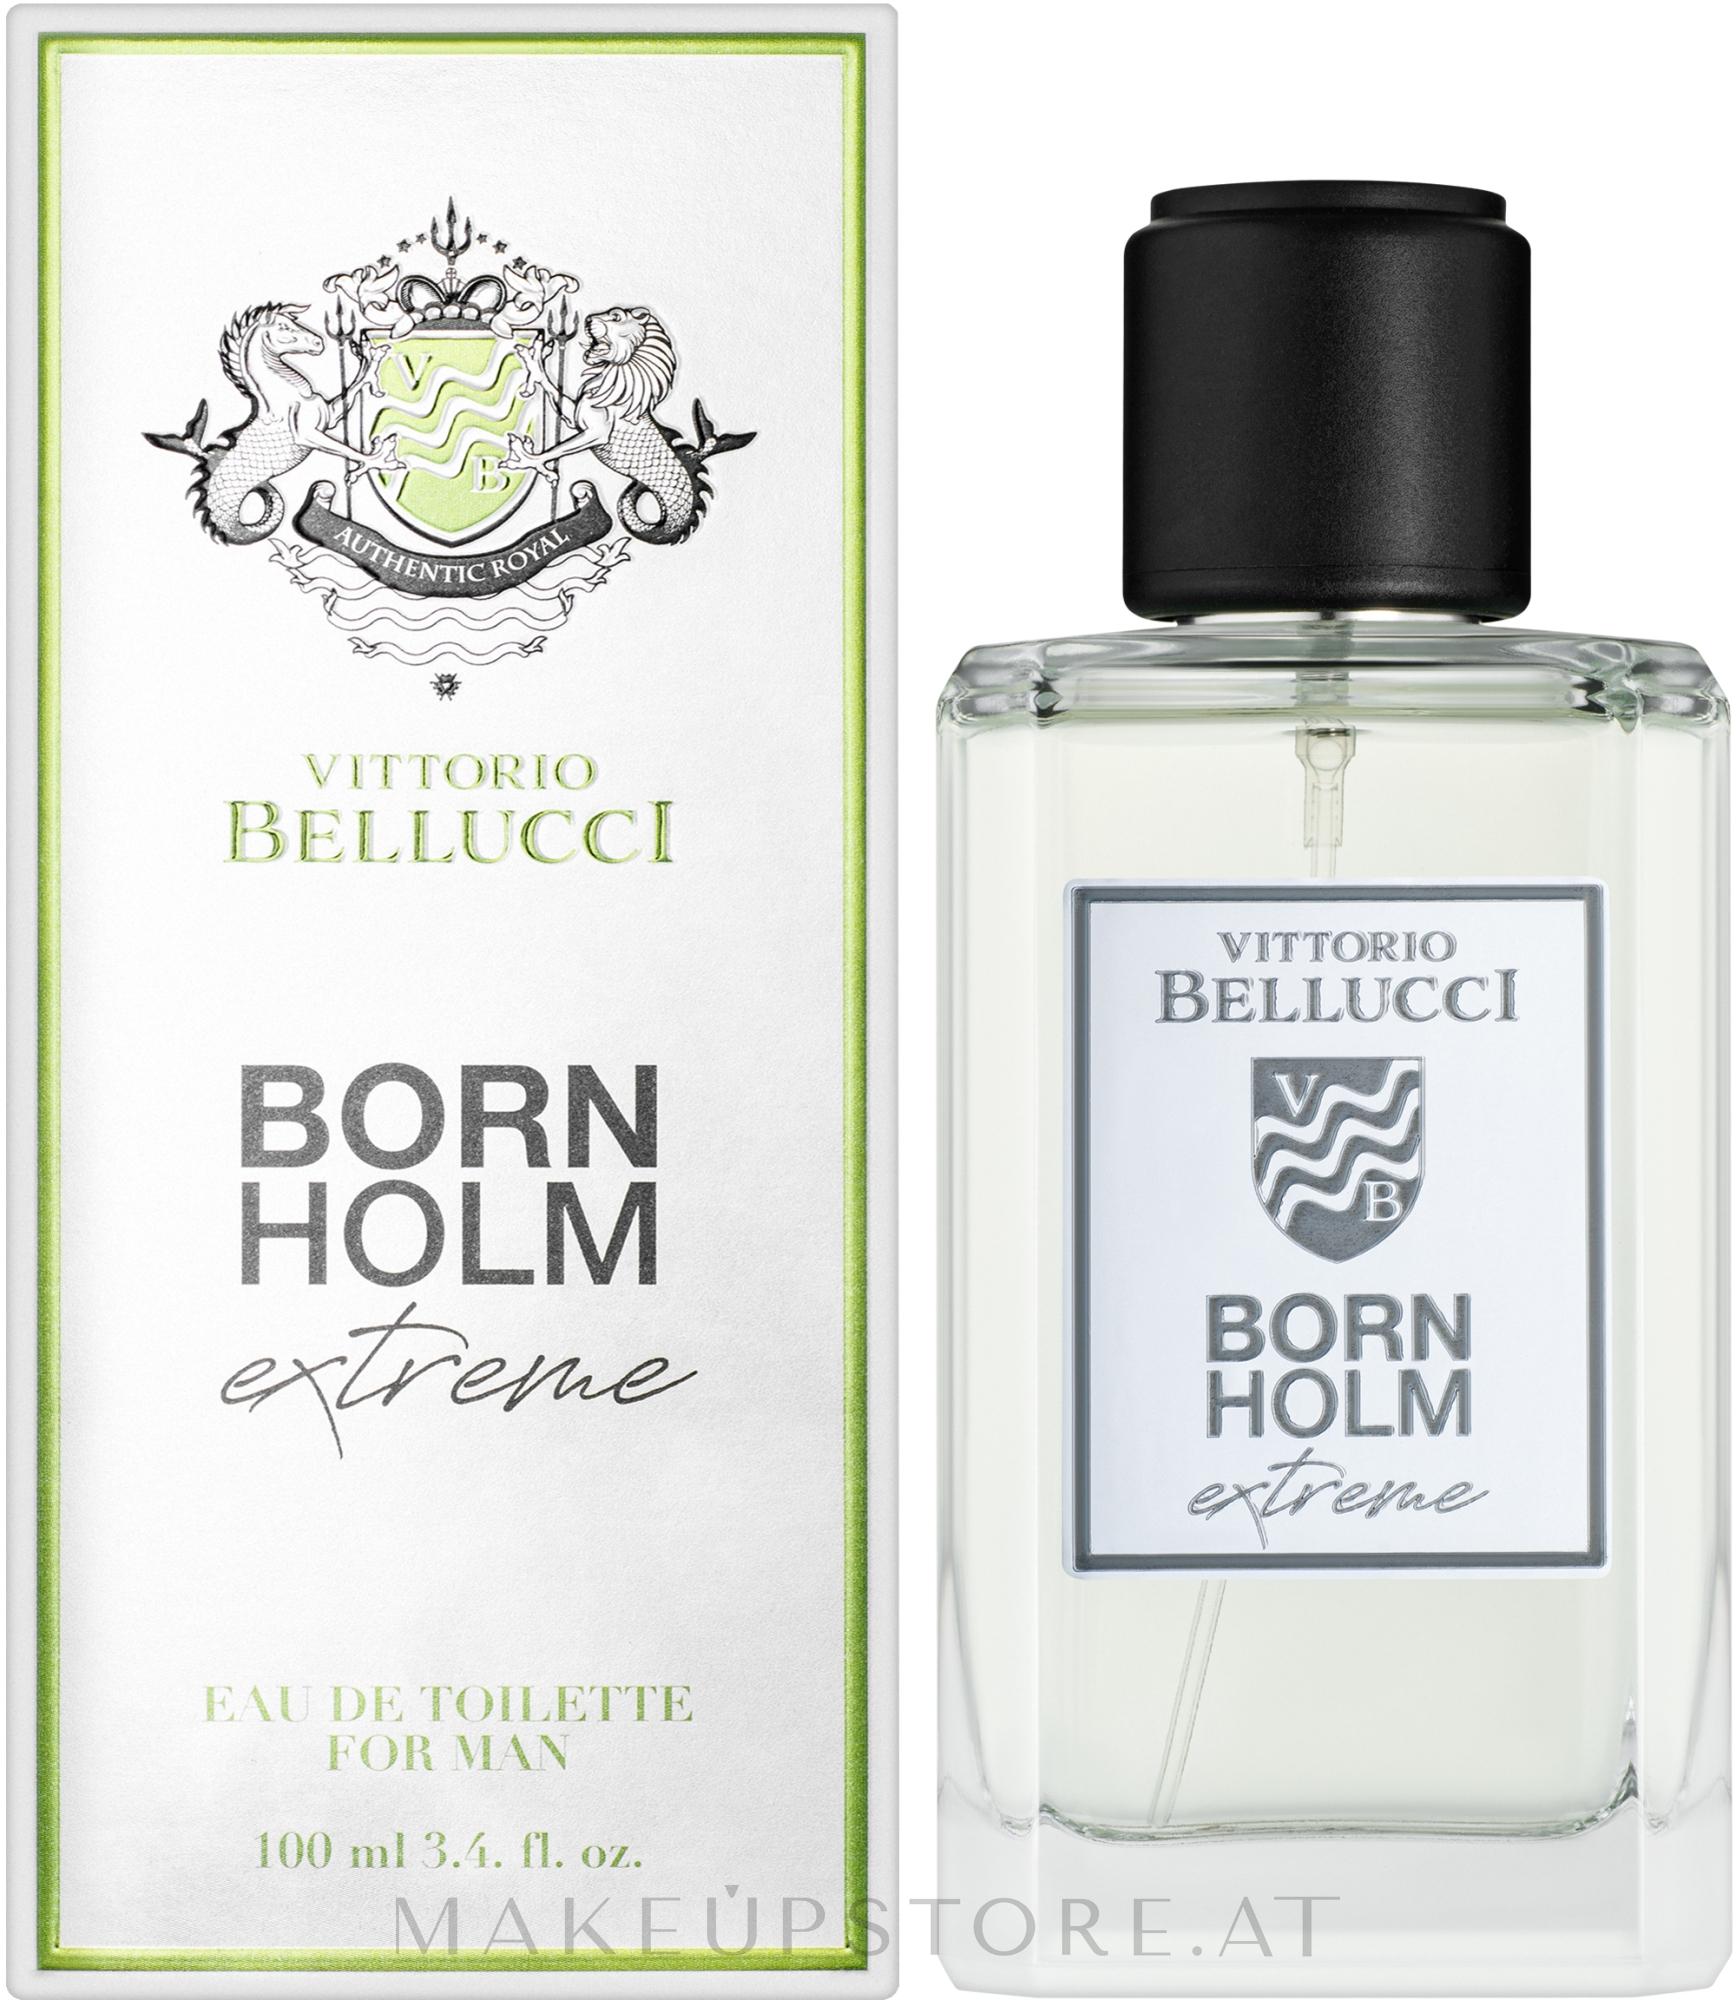 Vittorio Bellucci Born Holm Extreme Collection - Eau de Toilette — Bild 100 ml